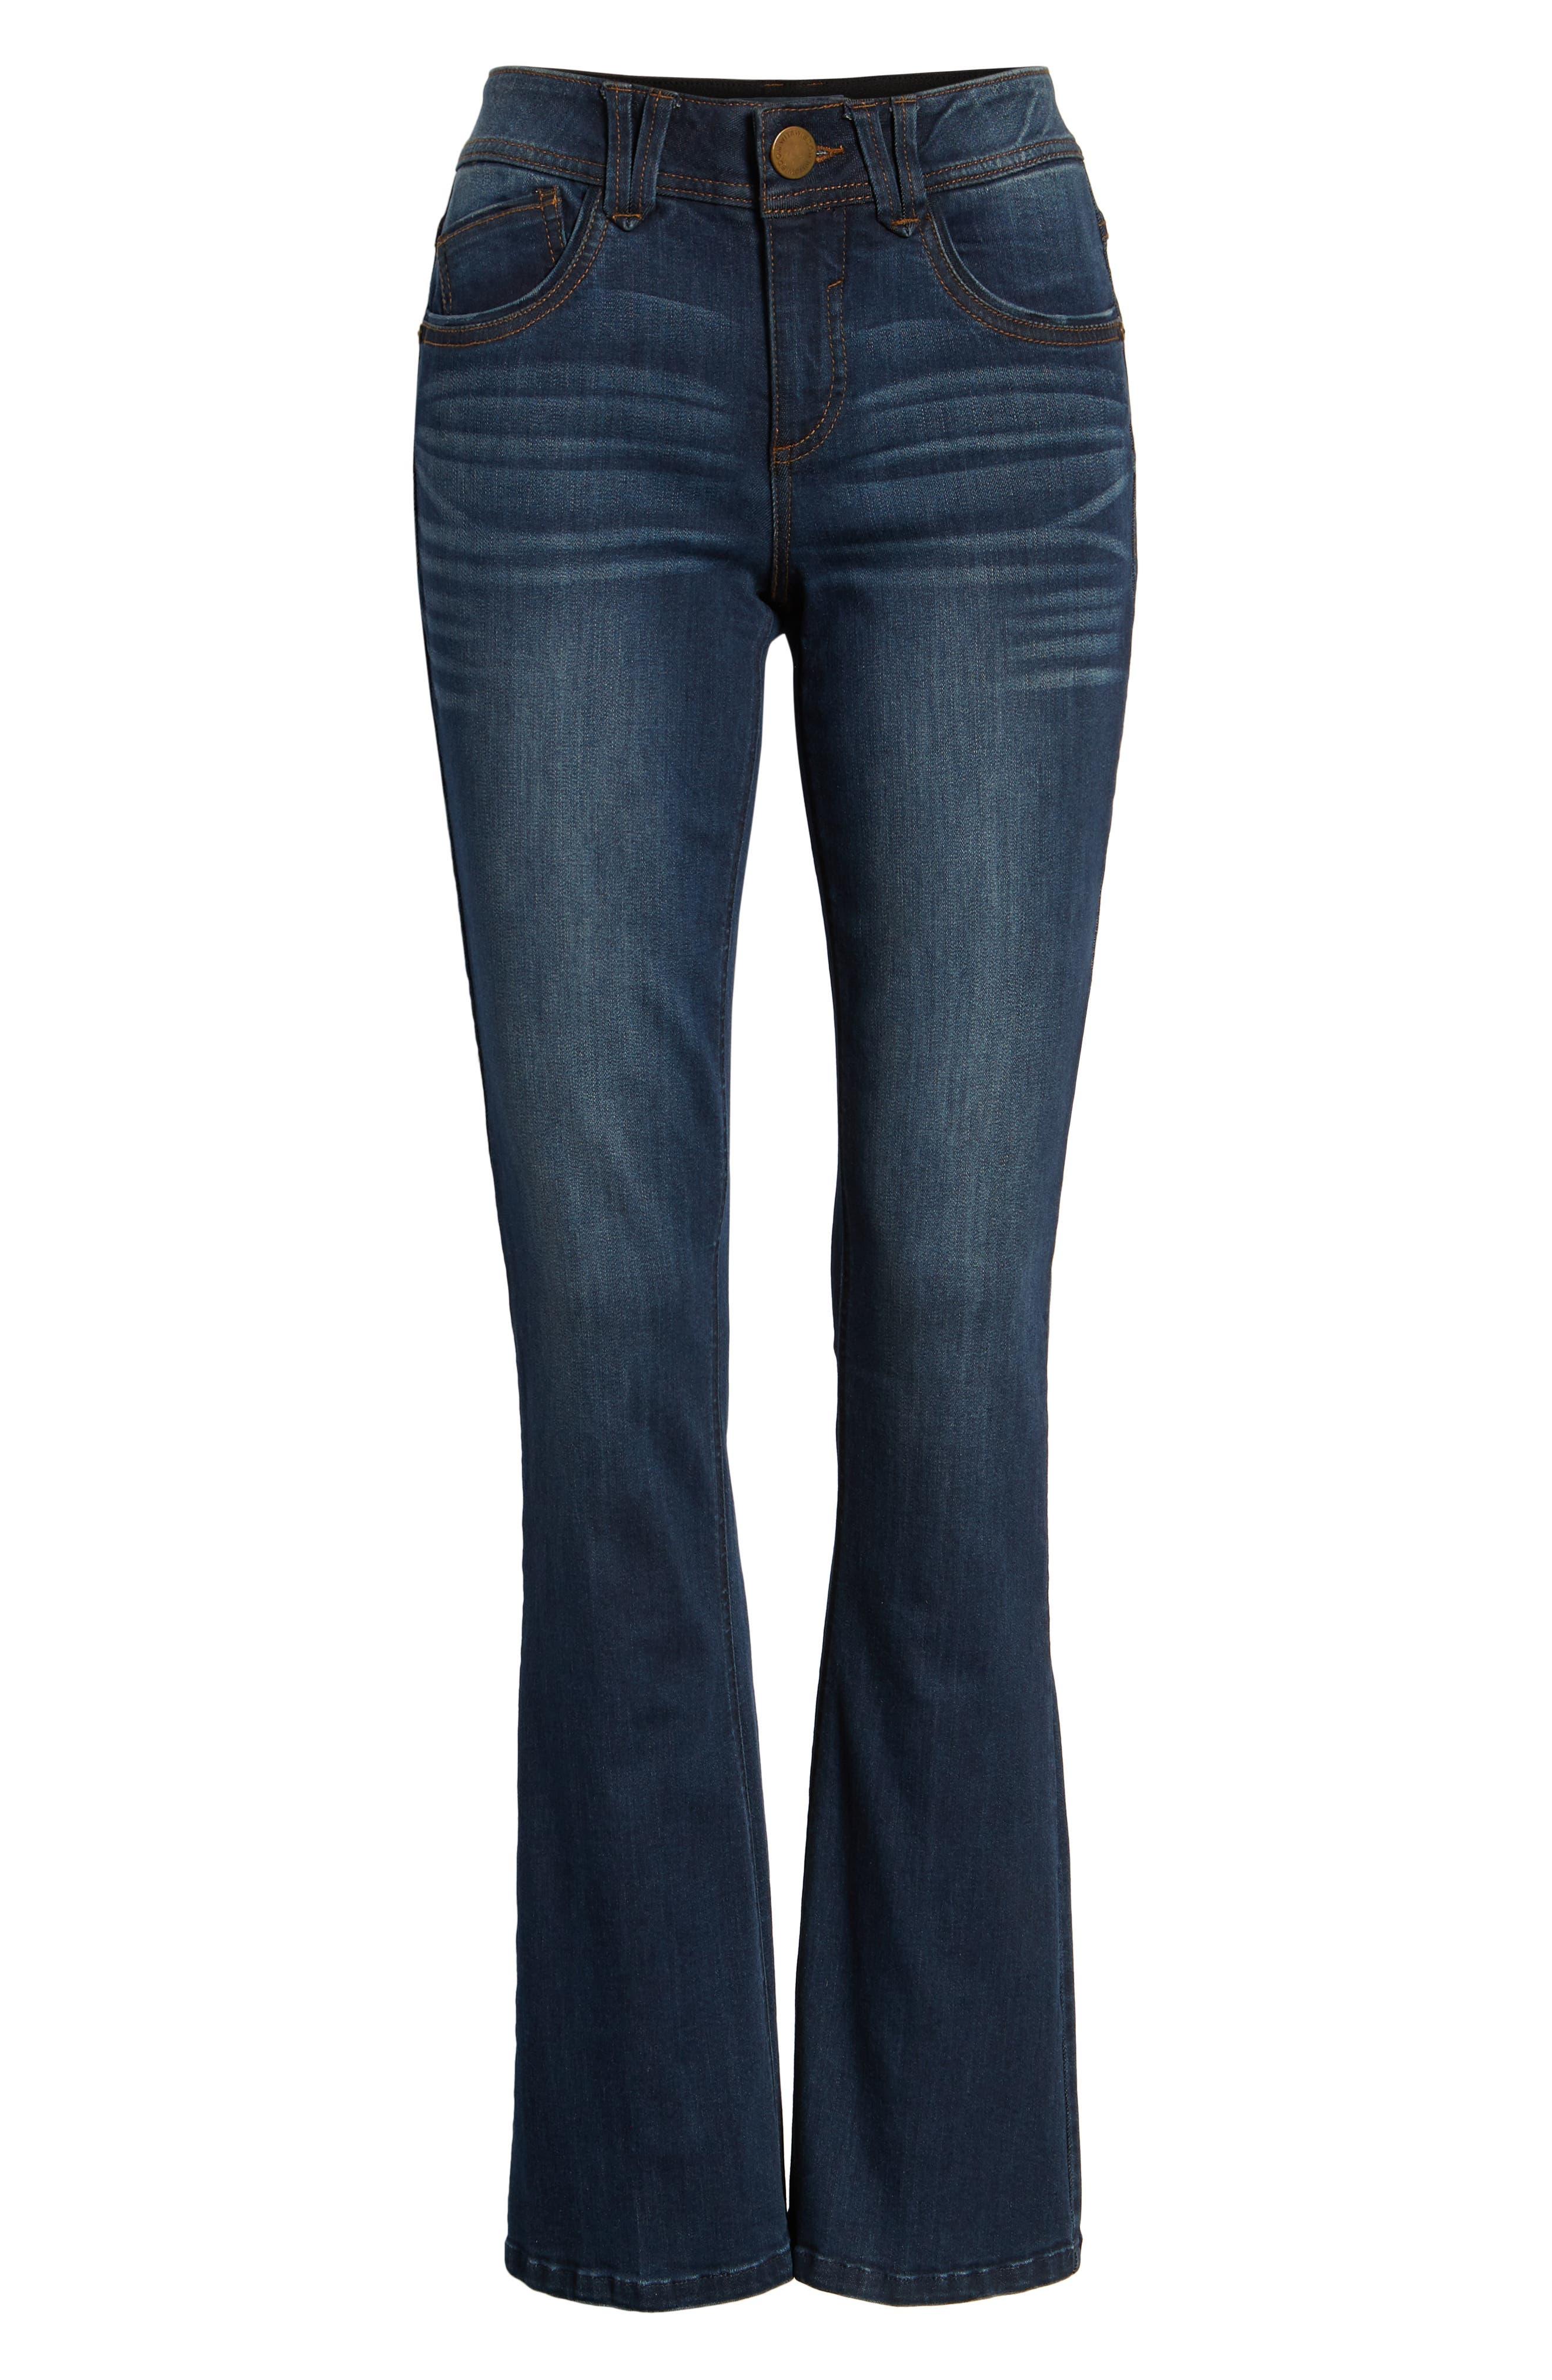 Ab-solution Luxe Touch Premium Jeans,                             Alternate thumbnail 7, color,                             420